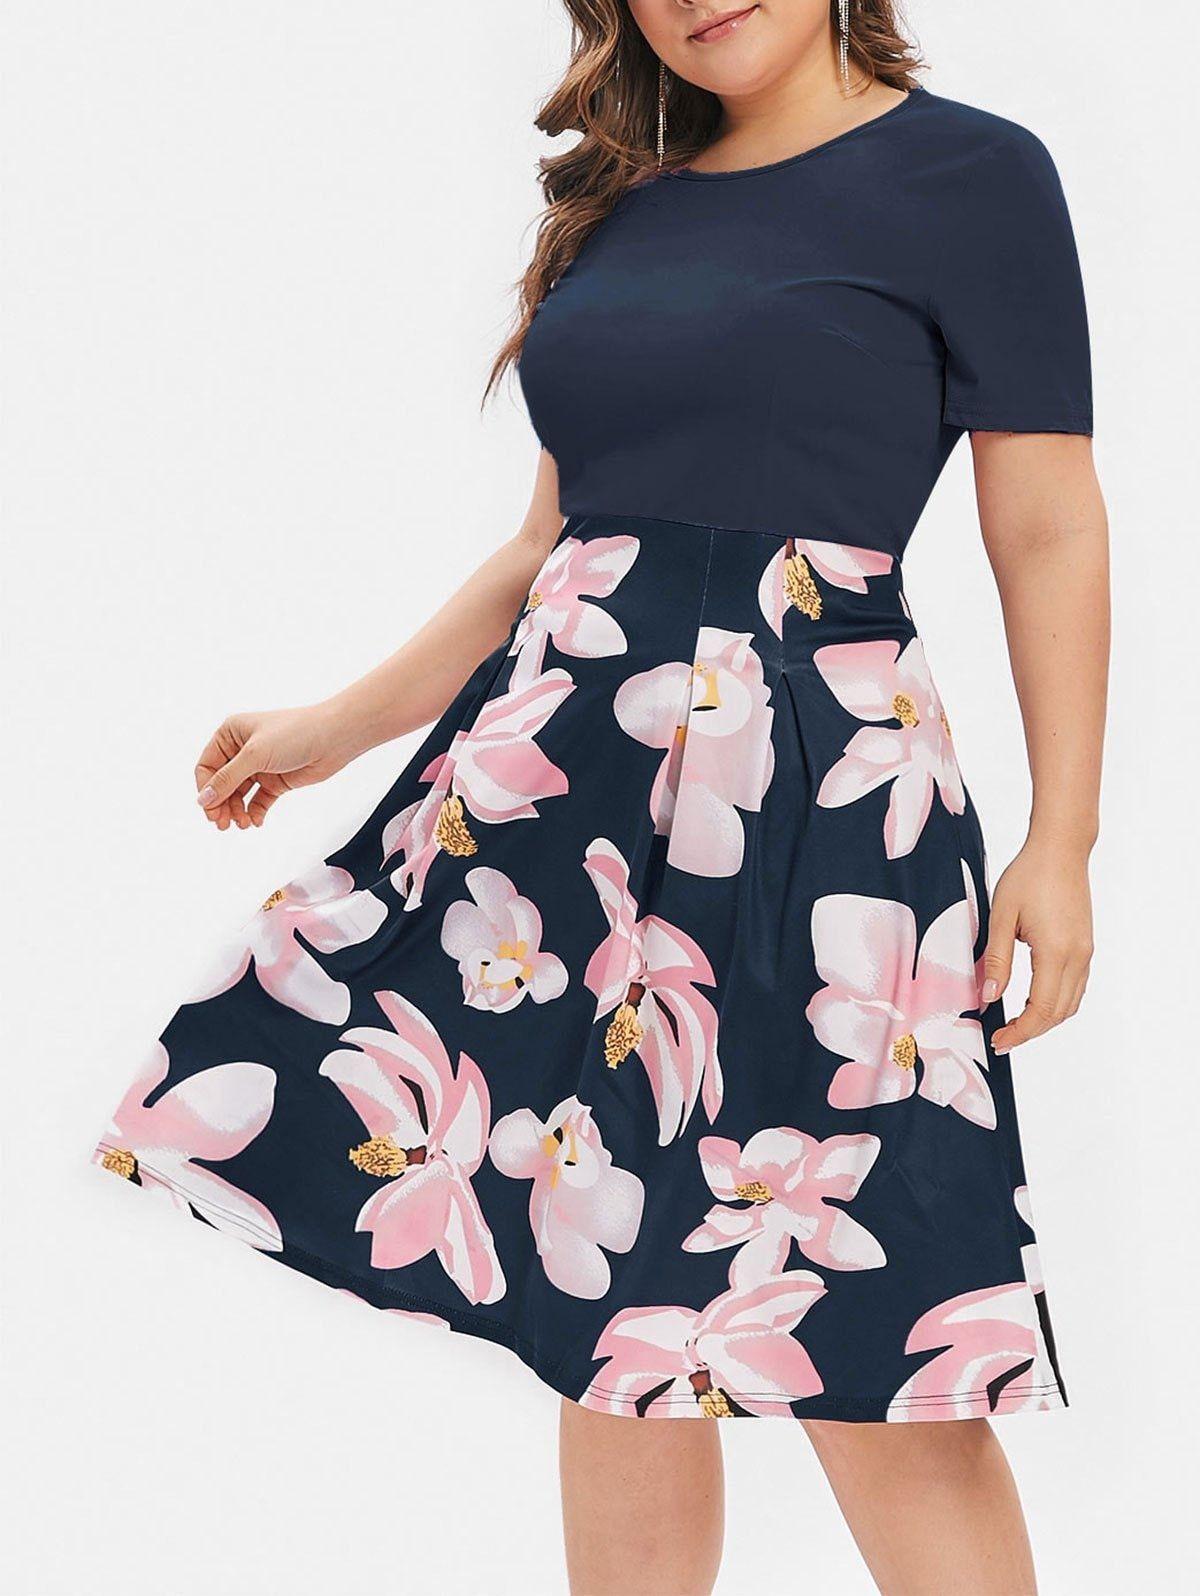 Plus Size Flower Print A Line Dress In 2020 Summer Dresses For Women Women Dresses Classy A Line Dress